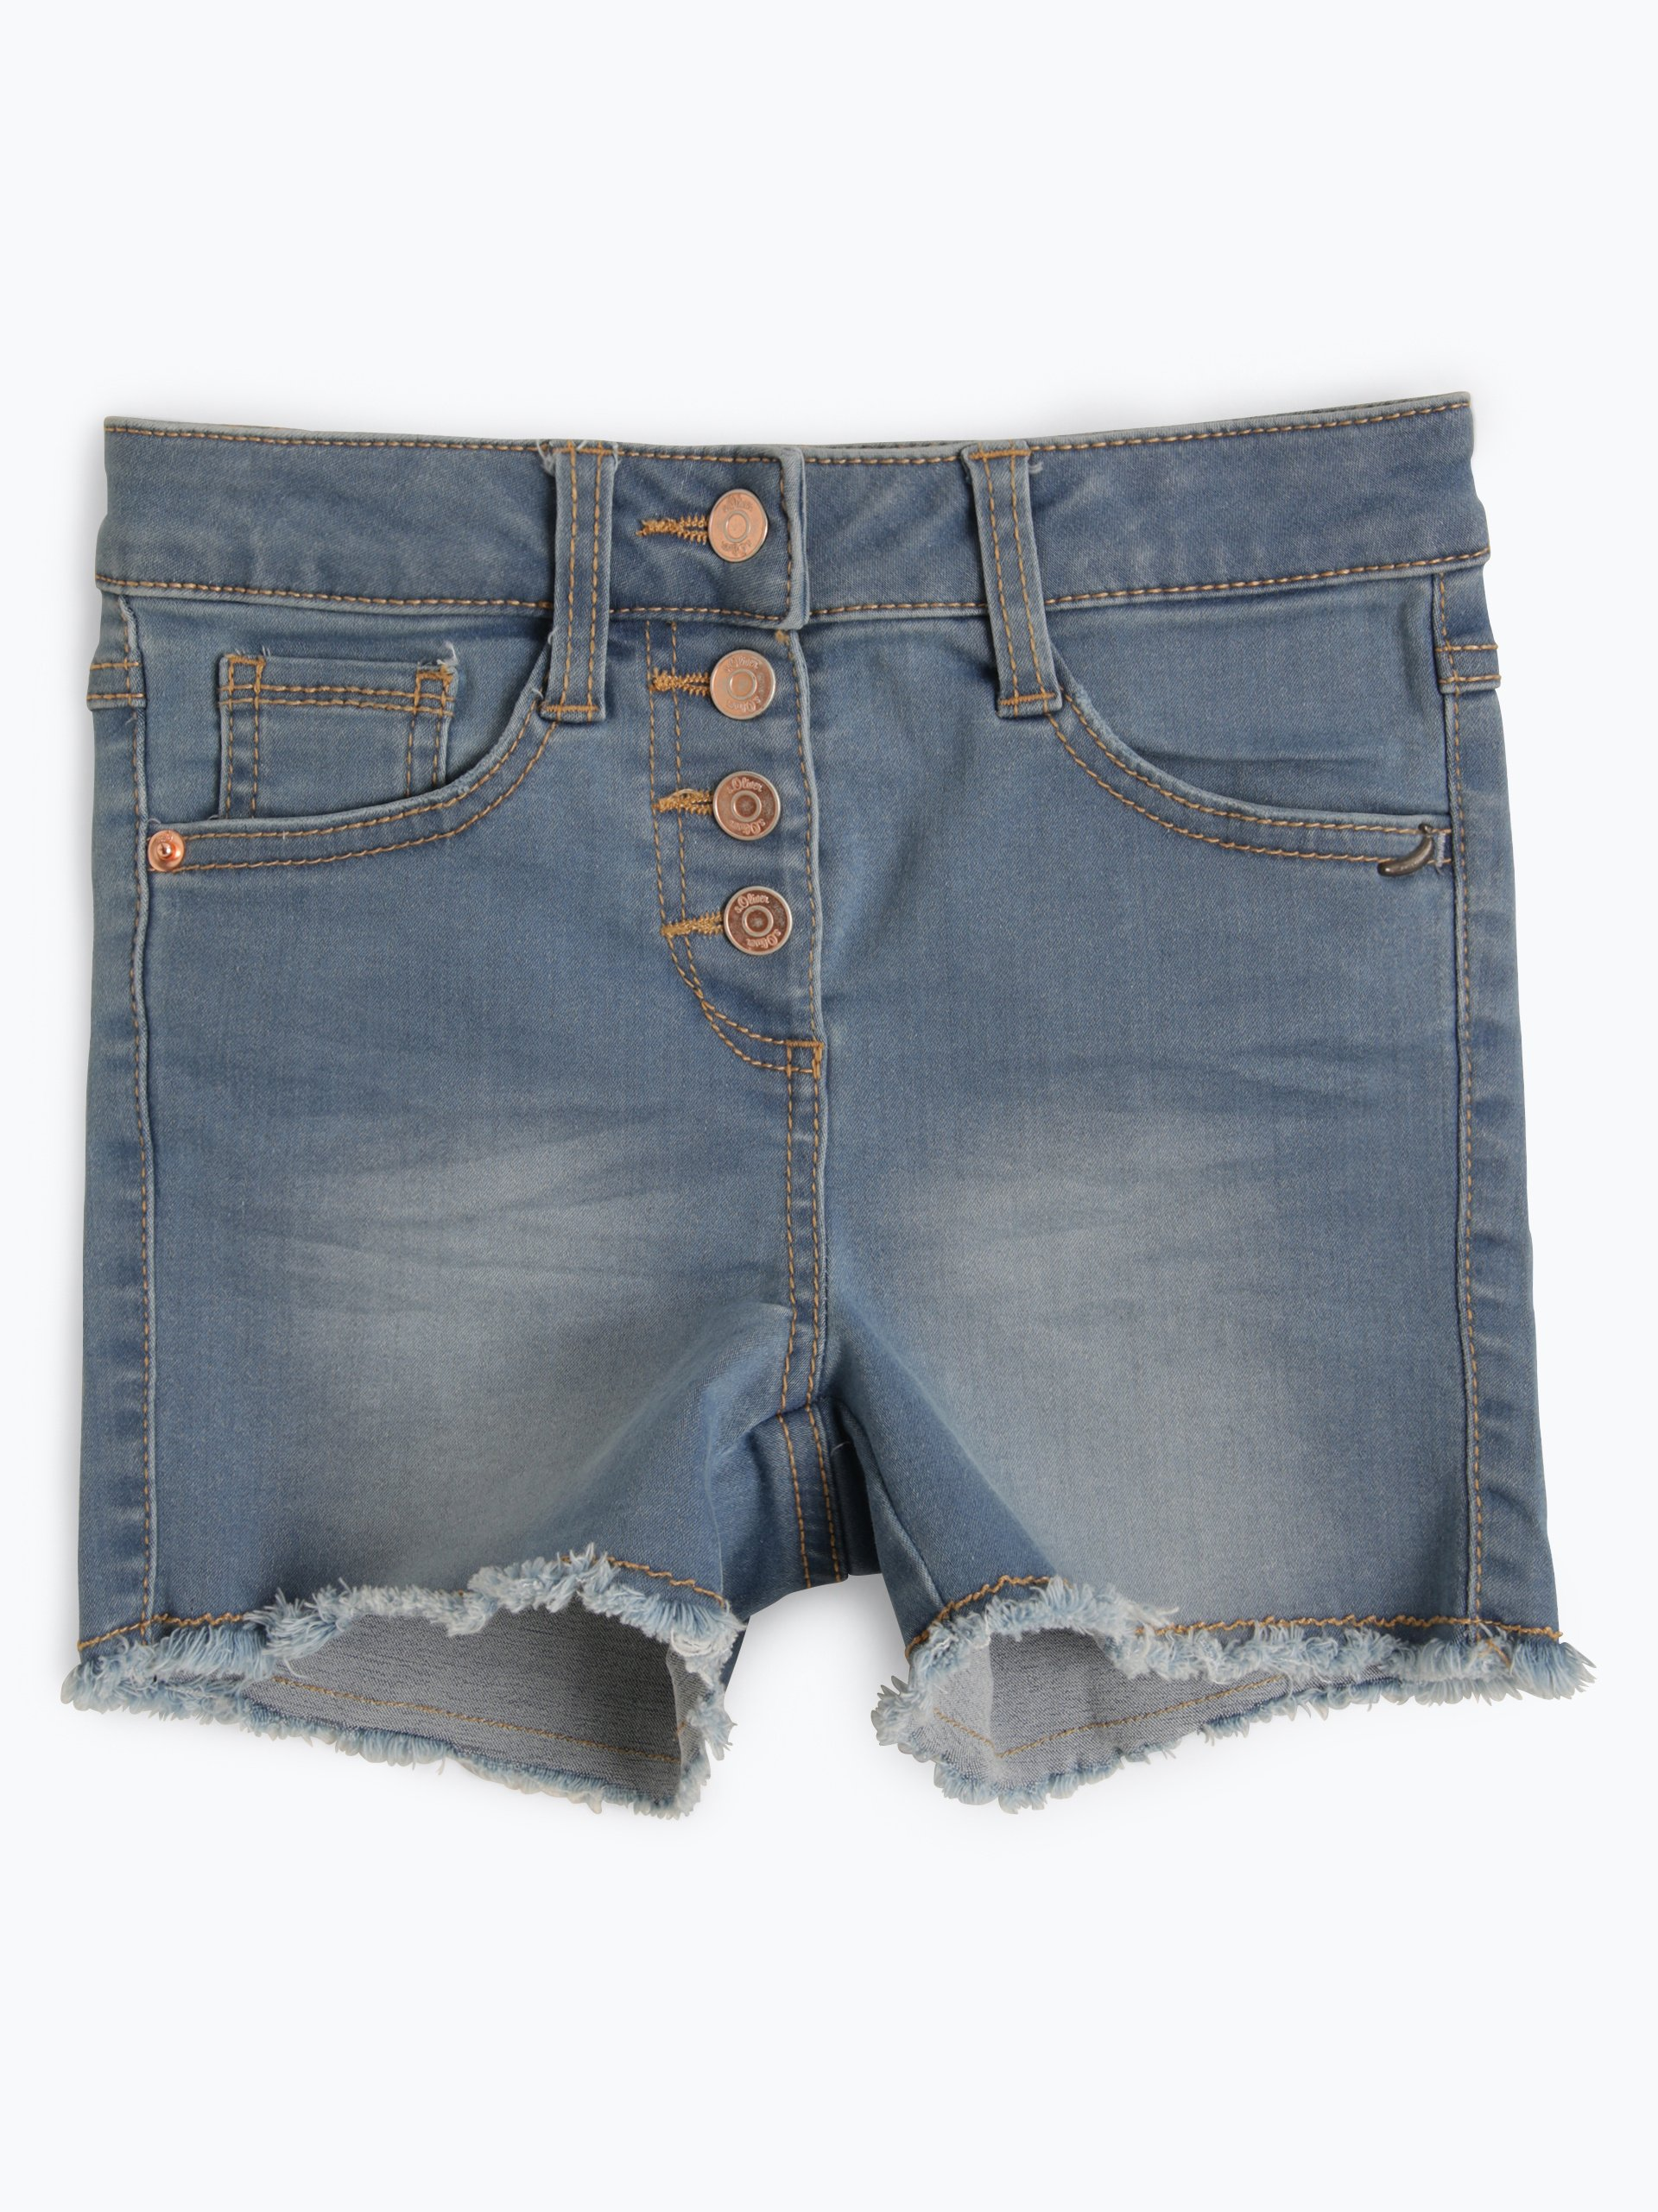 s.Oliver Casual Mädchen Jeansshorts Slim Fit - Skinny Suri